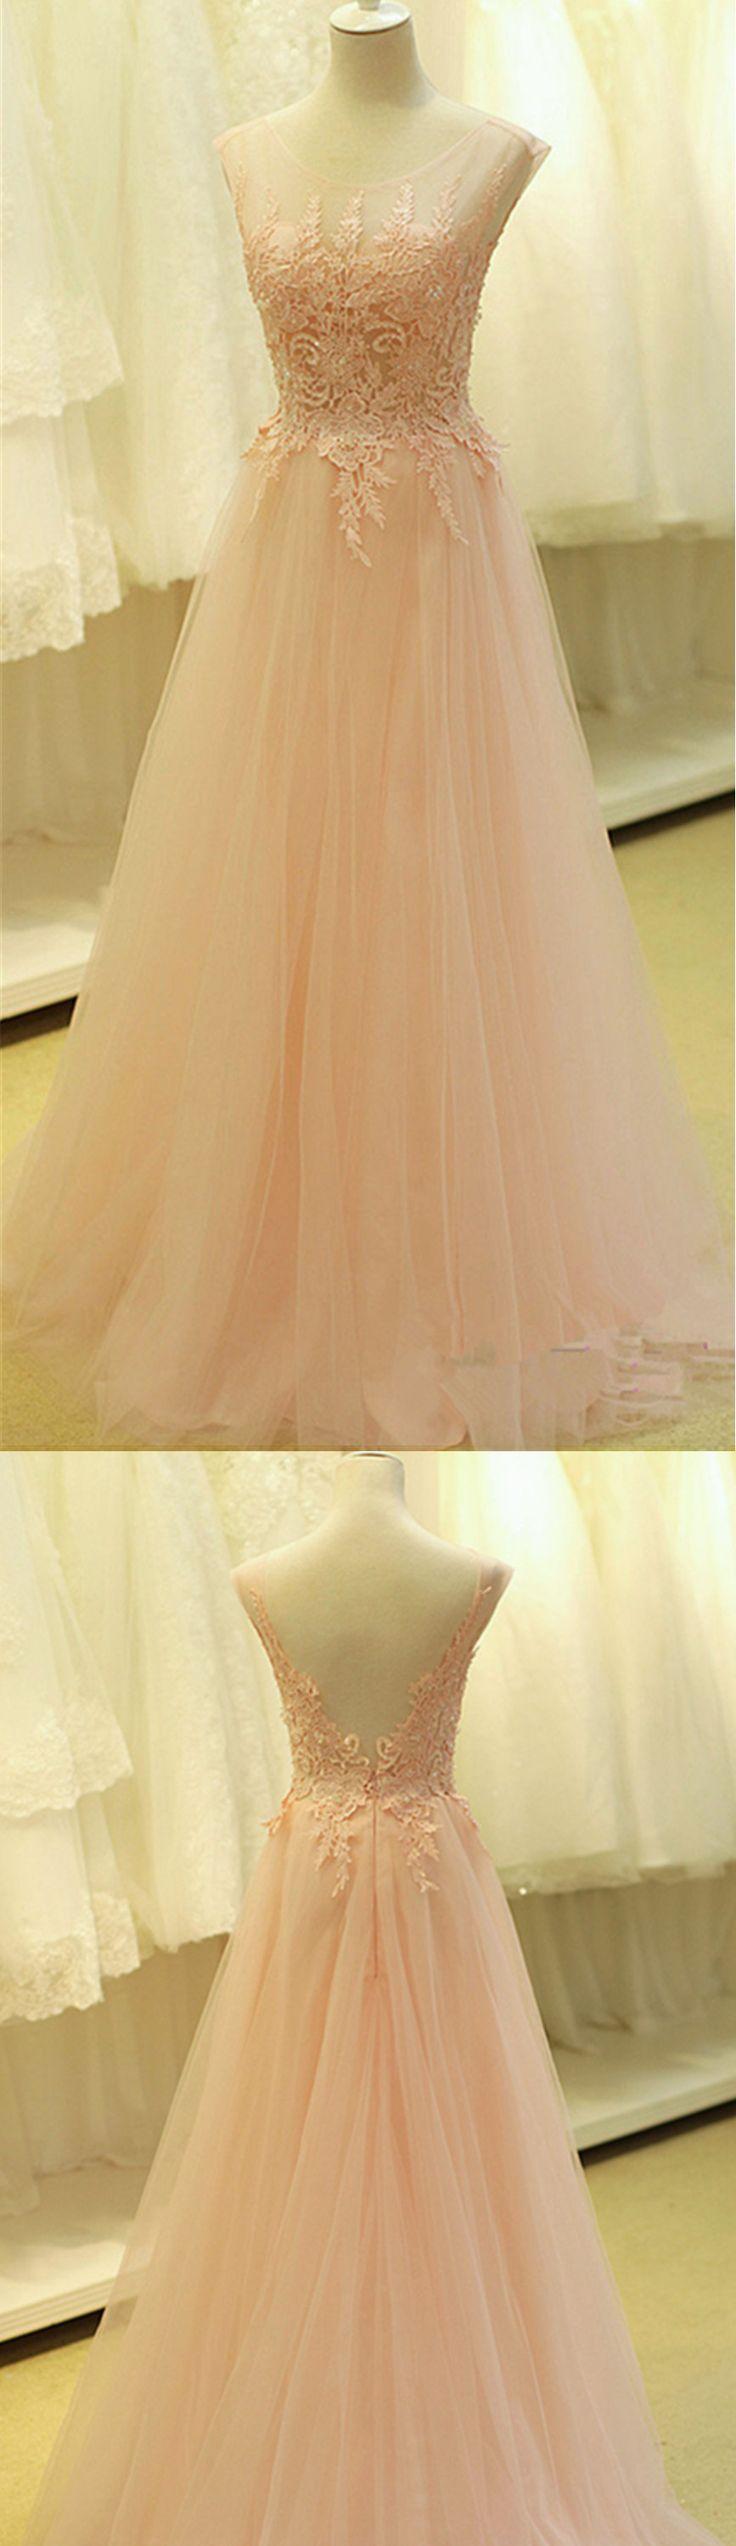 bridesmaid dresses Cute lace bridesmaid dresses , pink bridesmaid dresses,tulle prom dresses,long prom dress, evening dress 2016